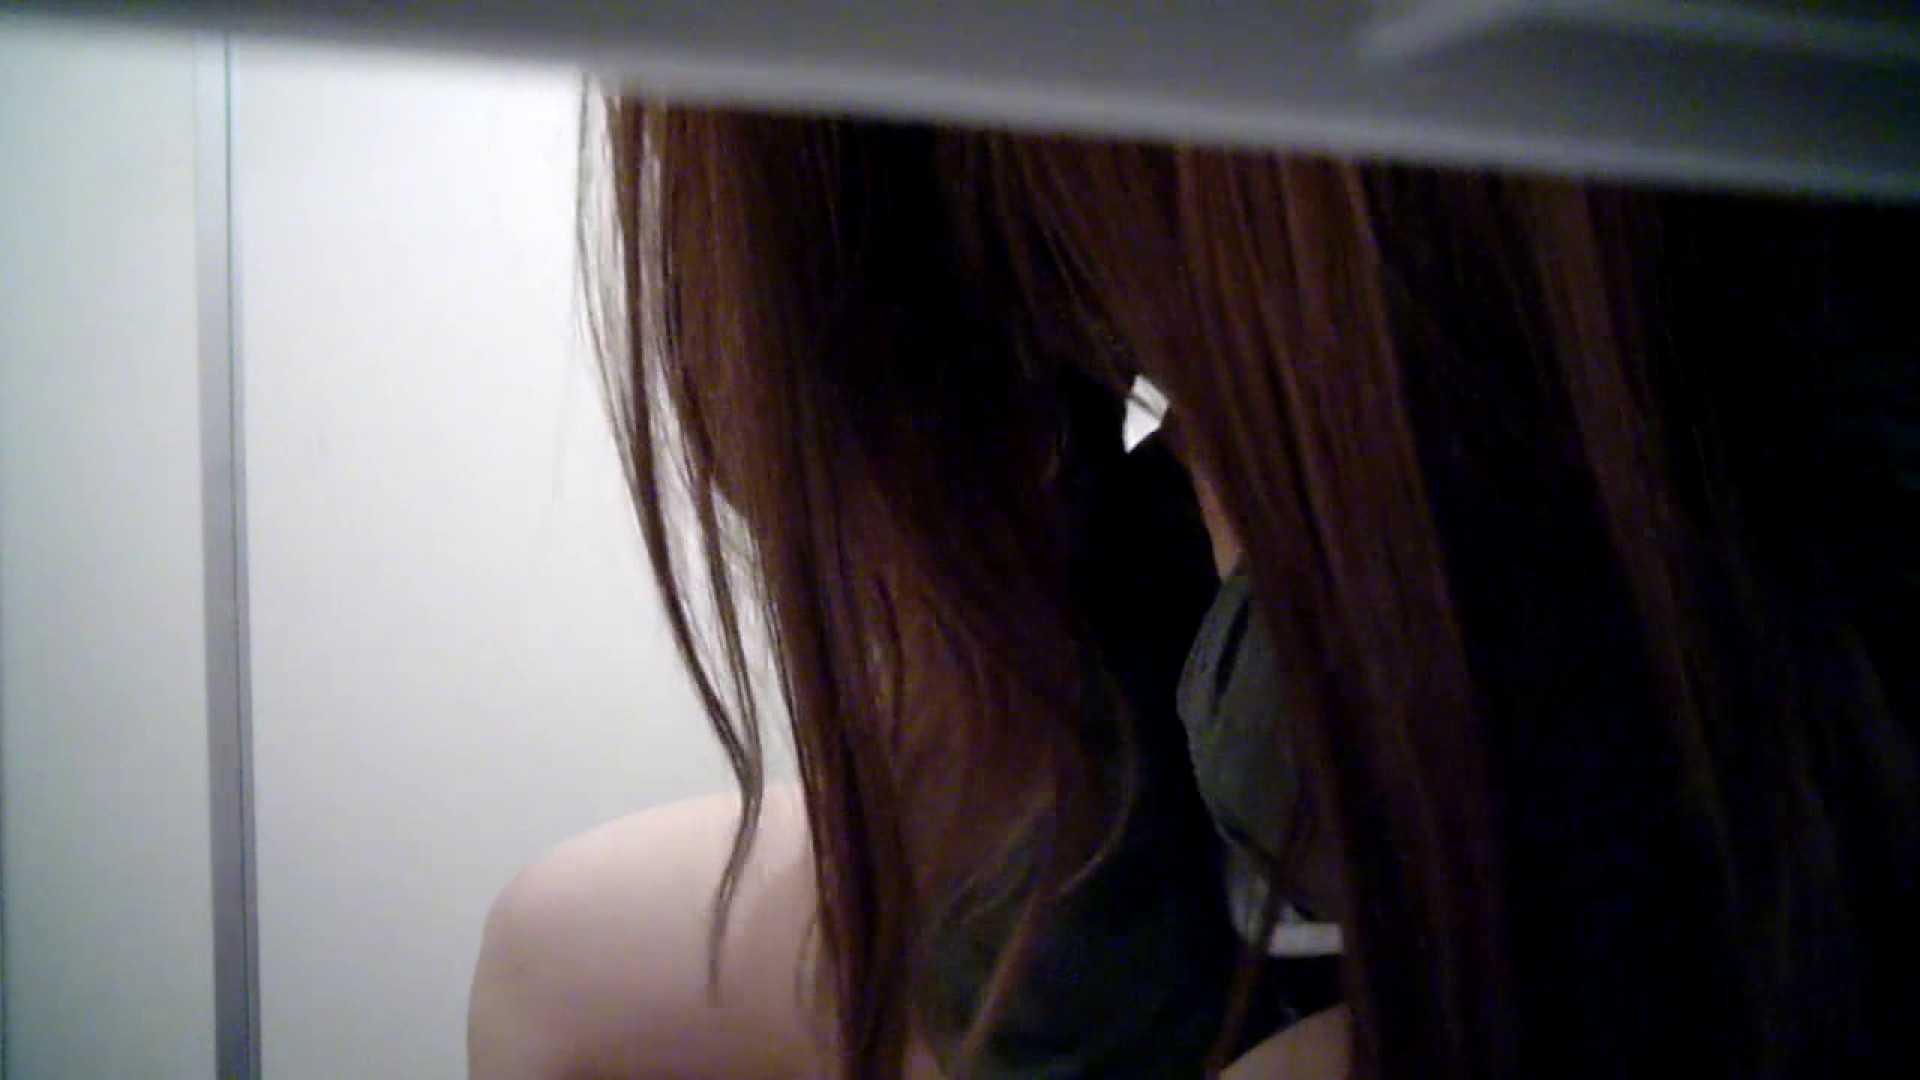 vol.28 最近では、黒いナプキンも売っているので…ファッ! ナプキン 性交動画流出 92枚 19